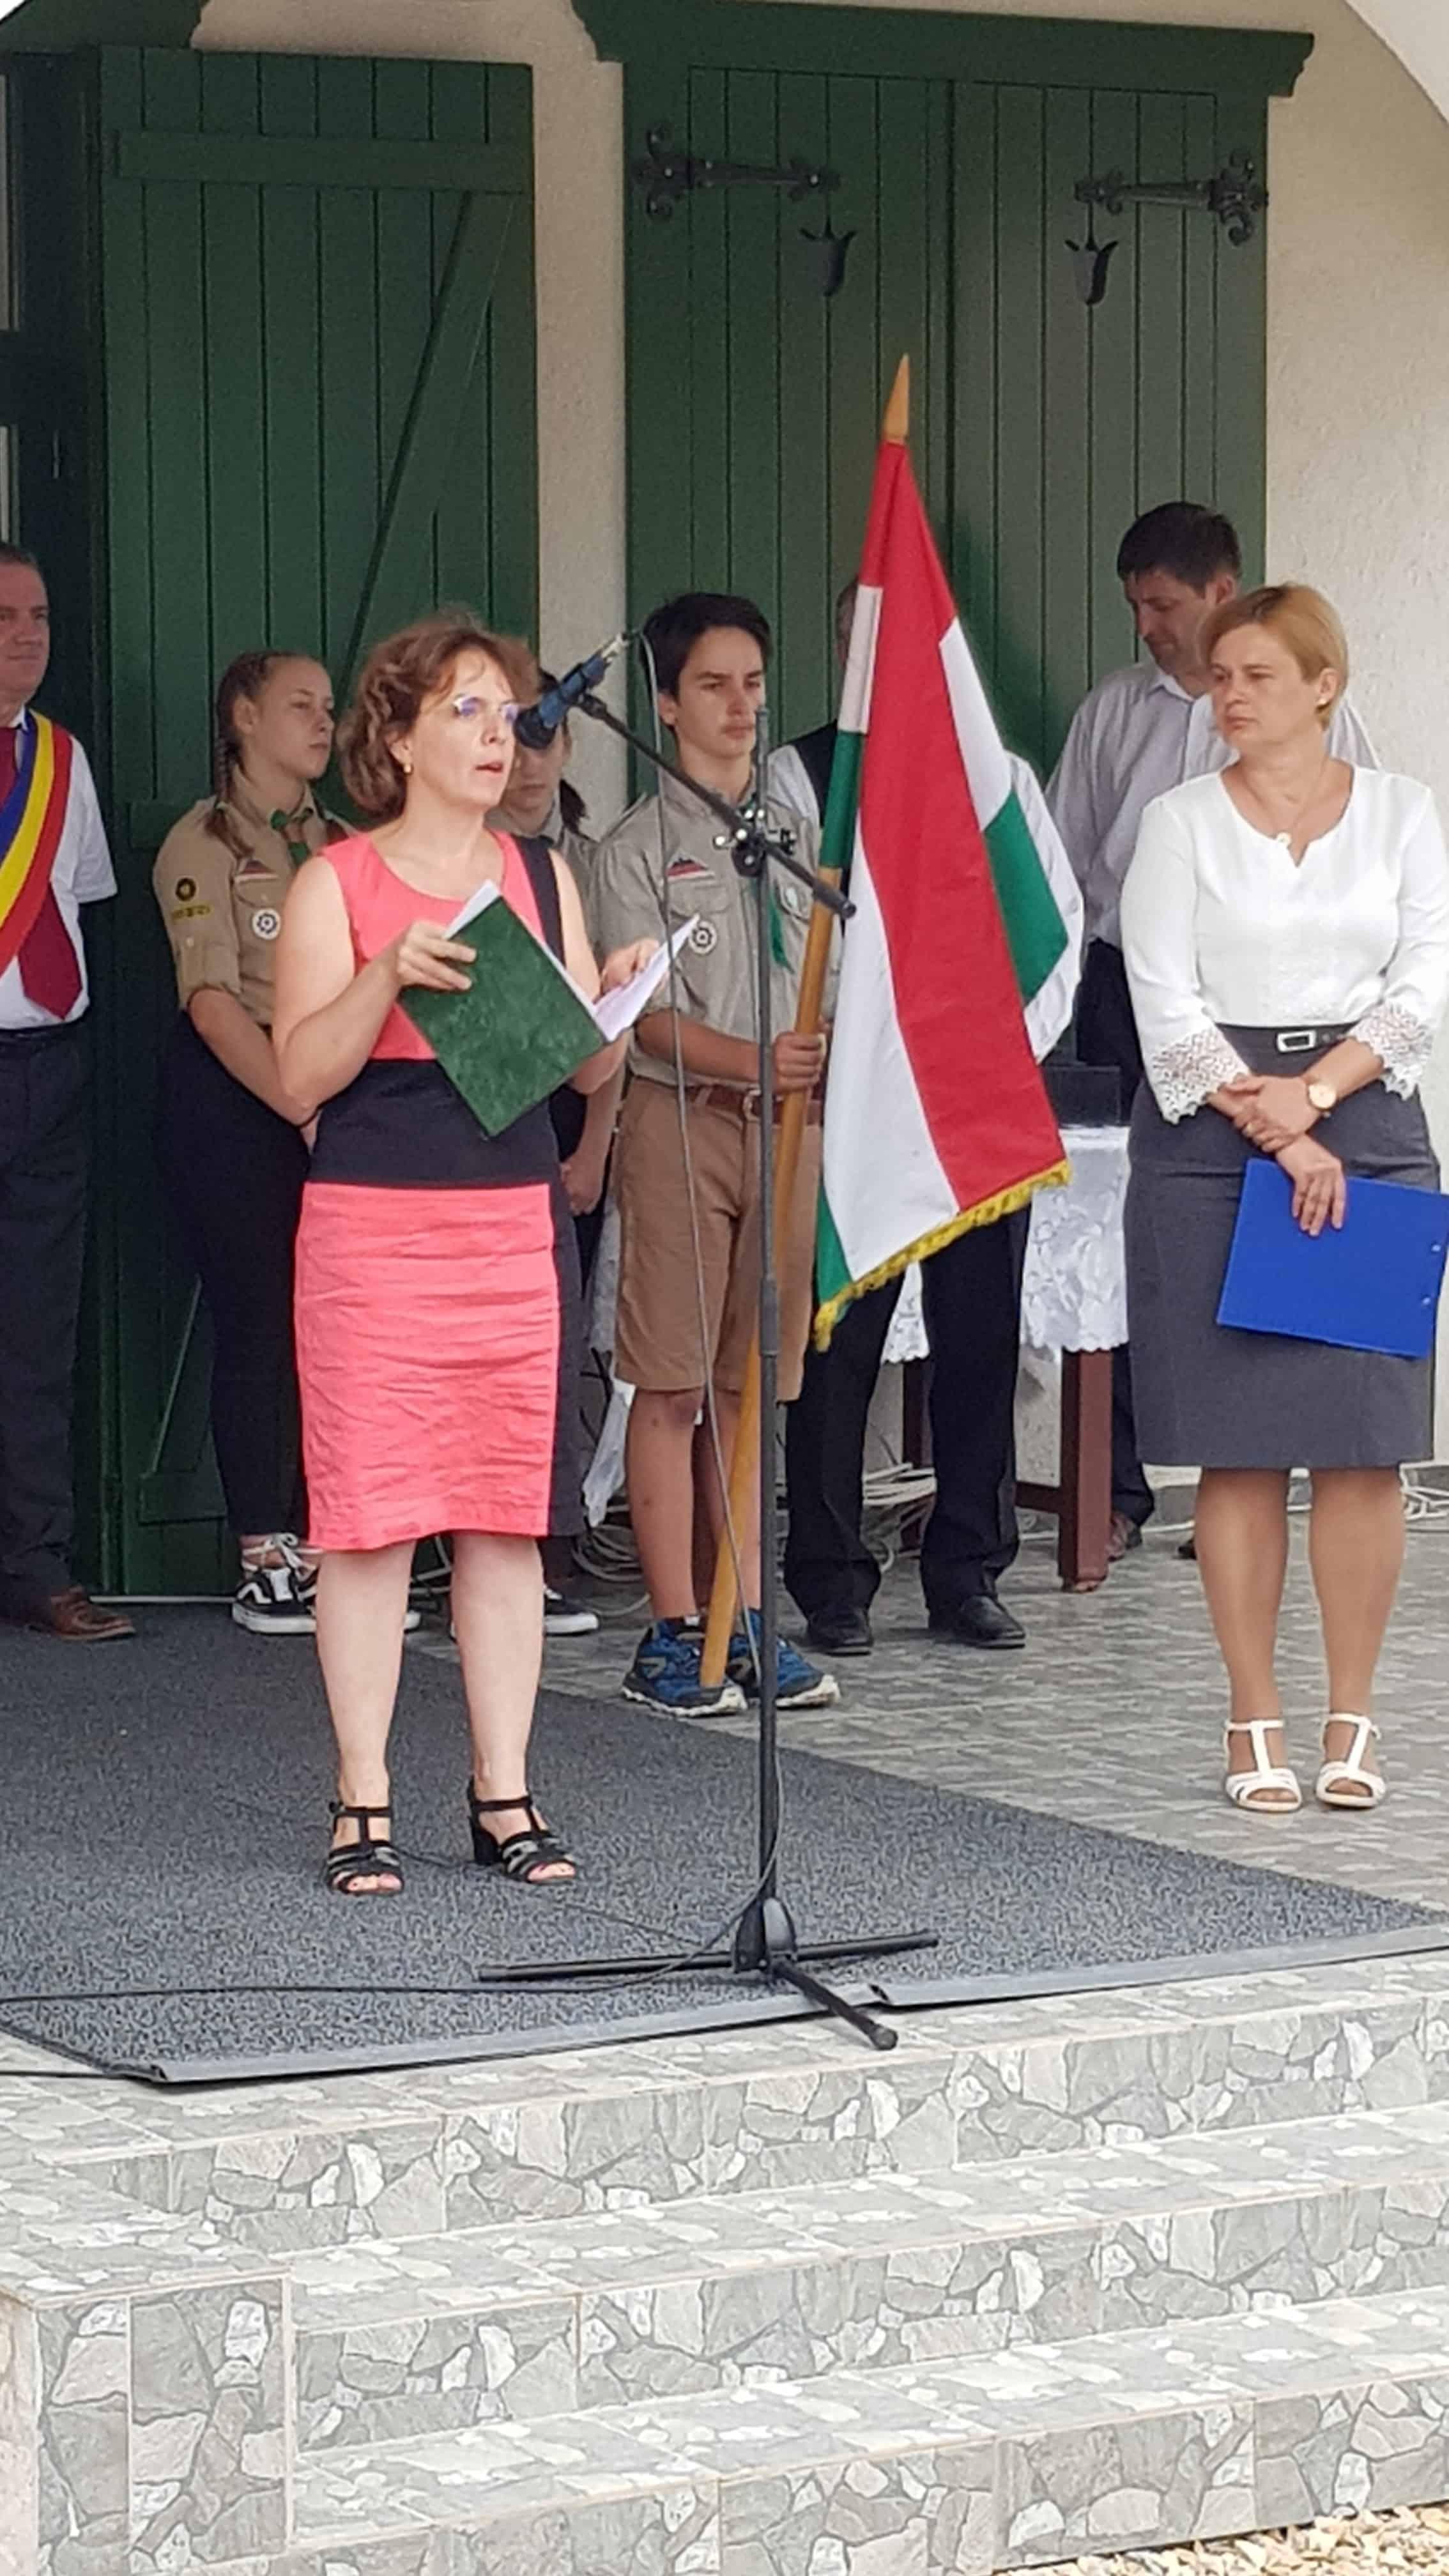 Demeter Stefánia Katalin konzul